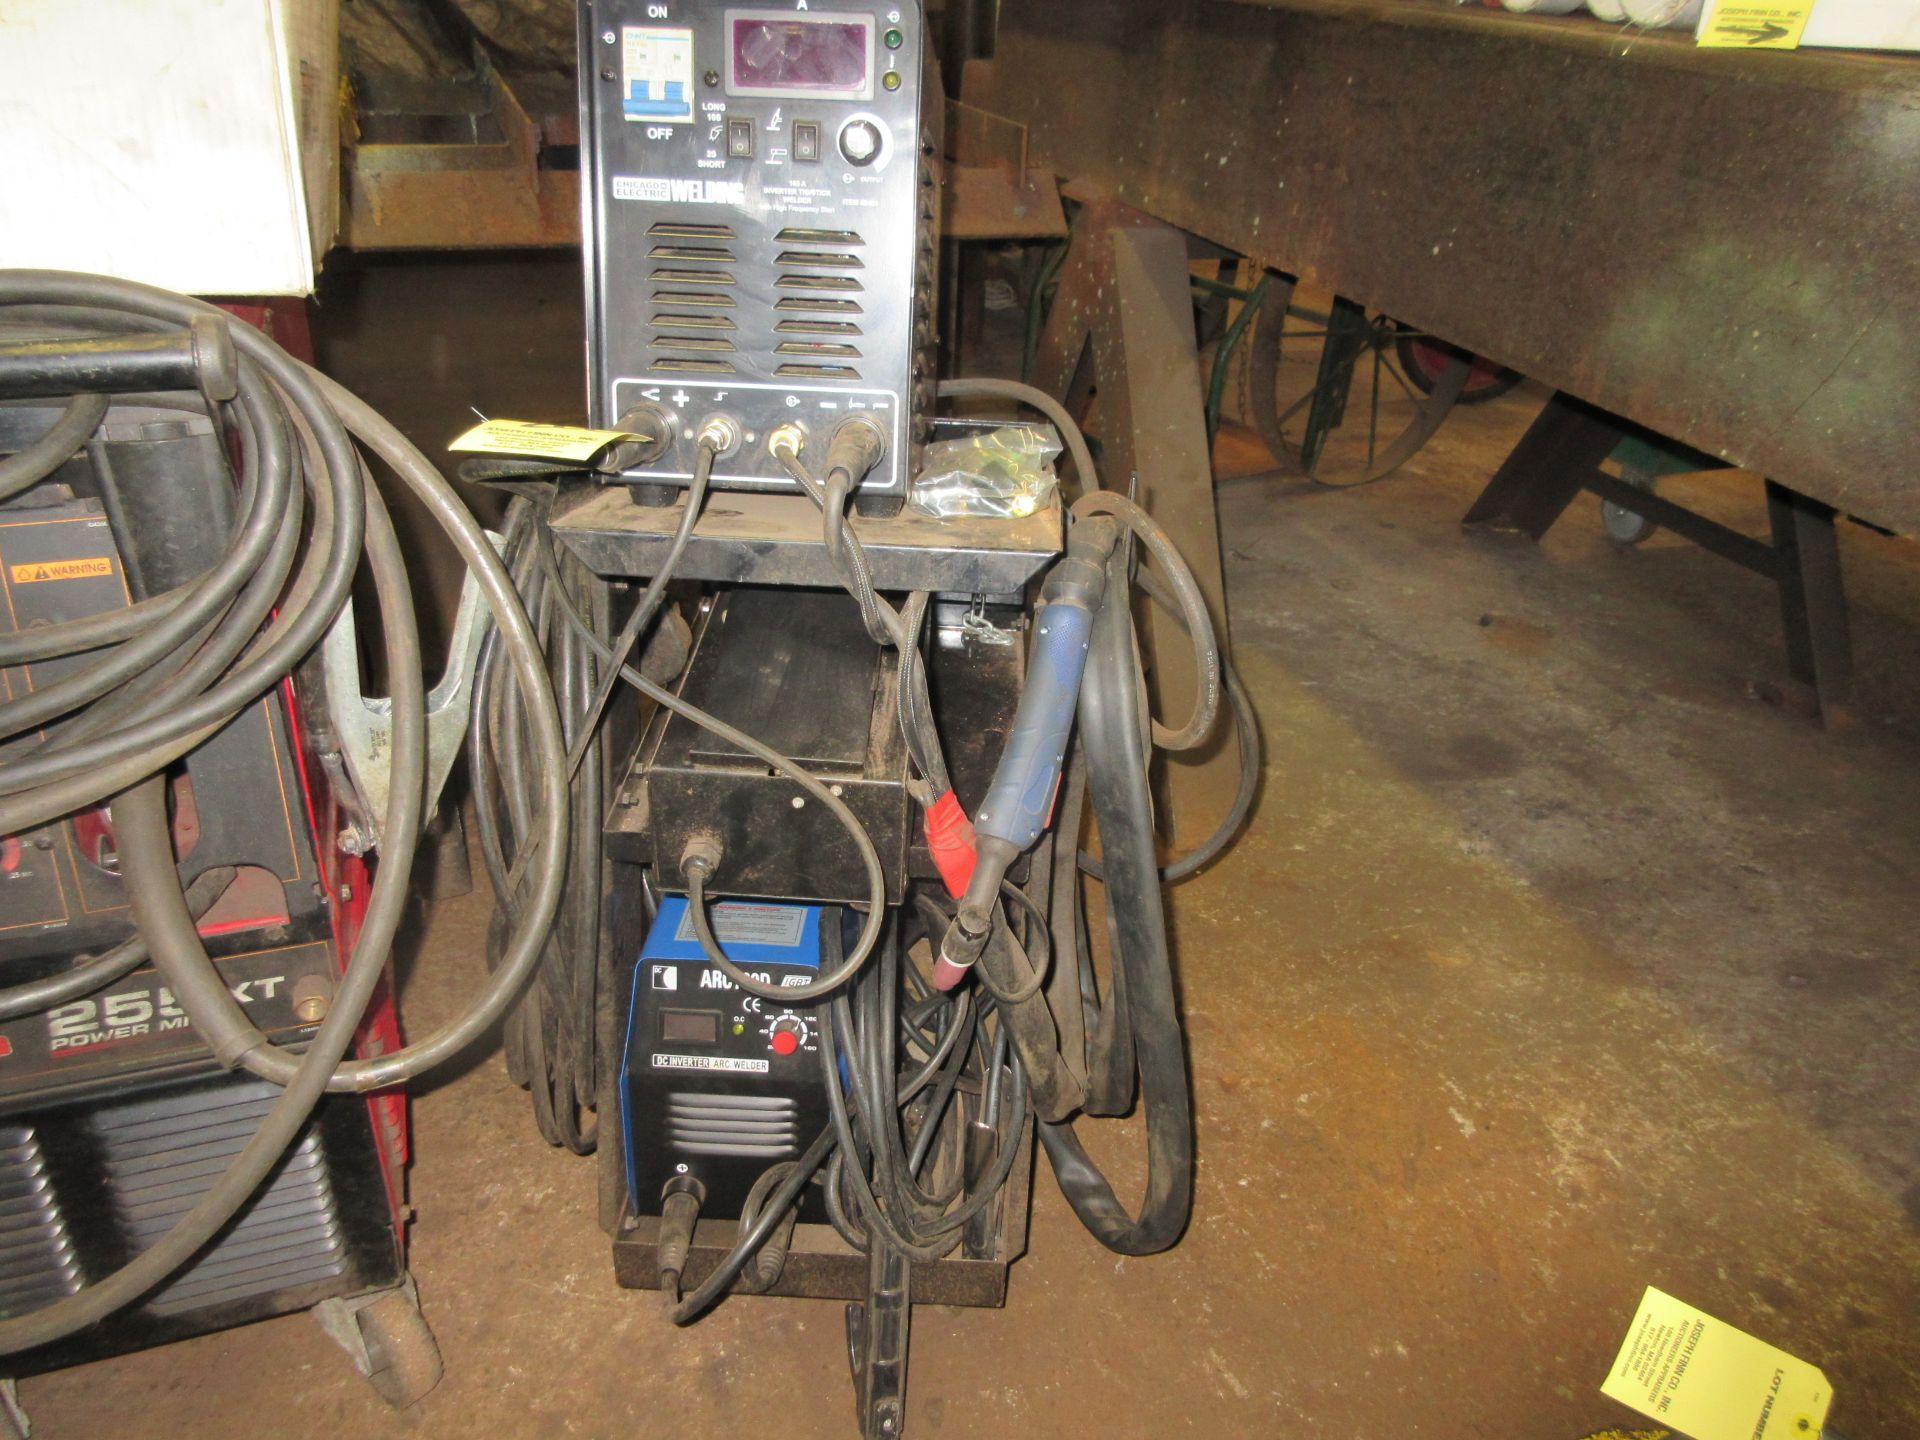 (1) IGBT Arc 160D Invertor Arc Welder w/ Chicago Electric Invertor Tig/Stick Welder, Foot Control